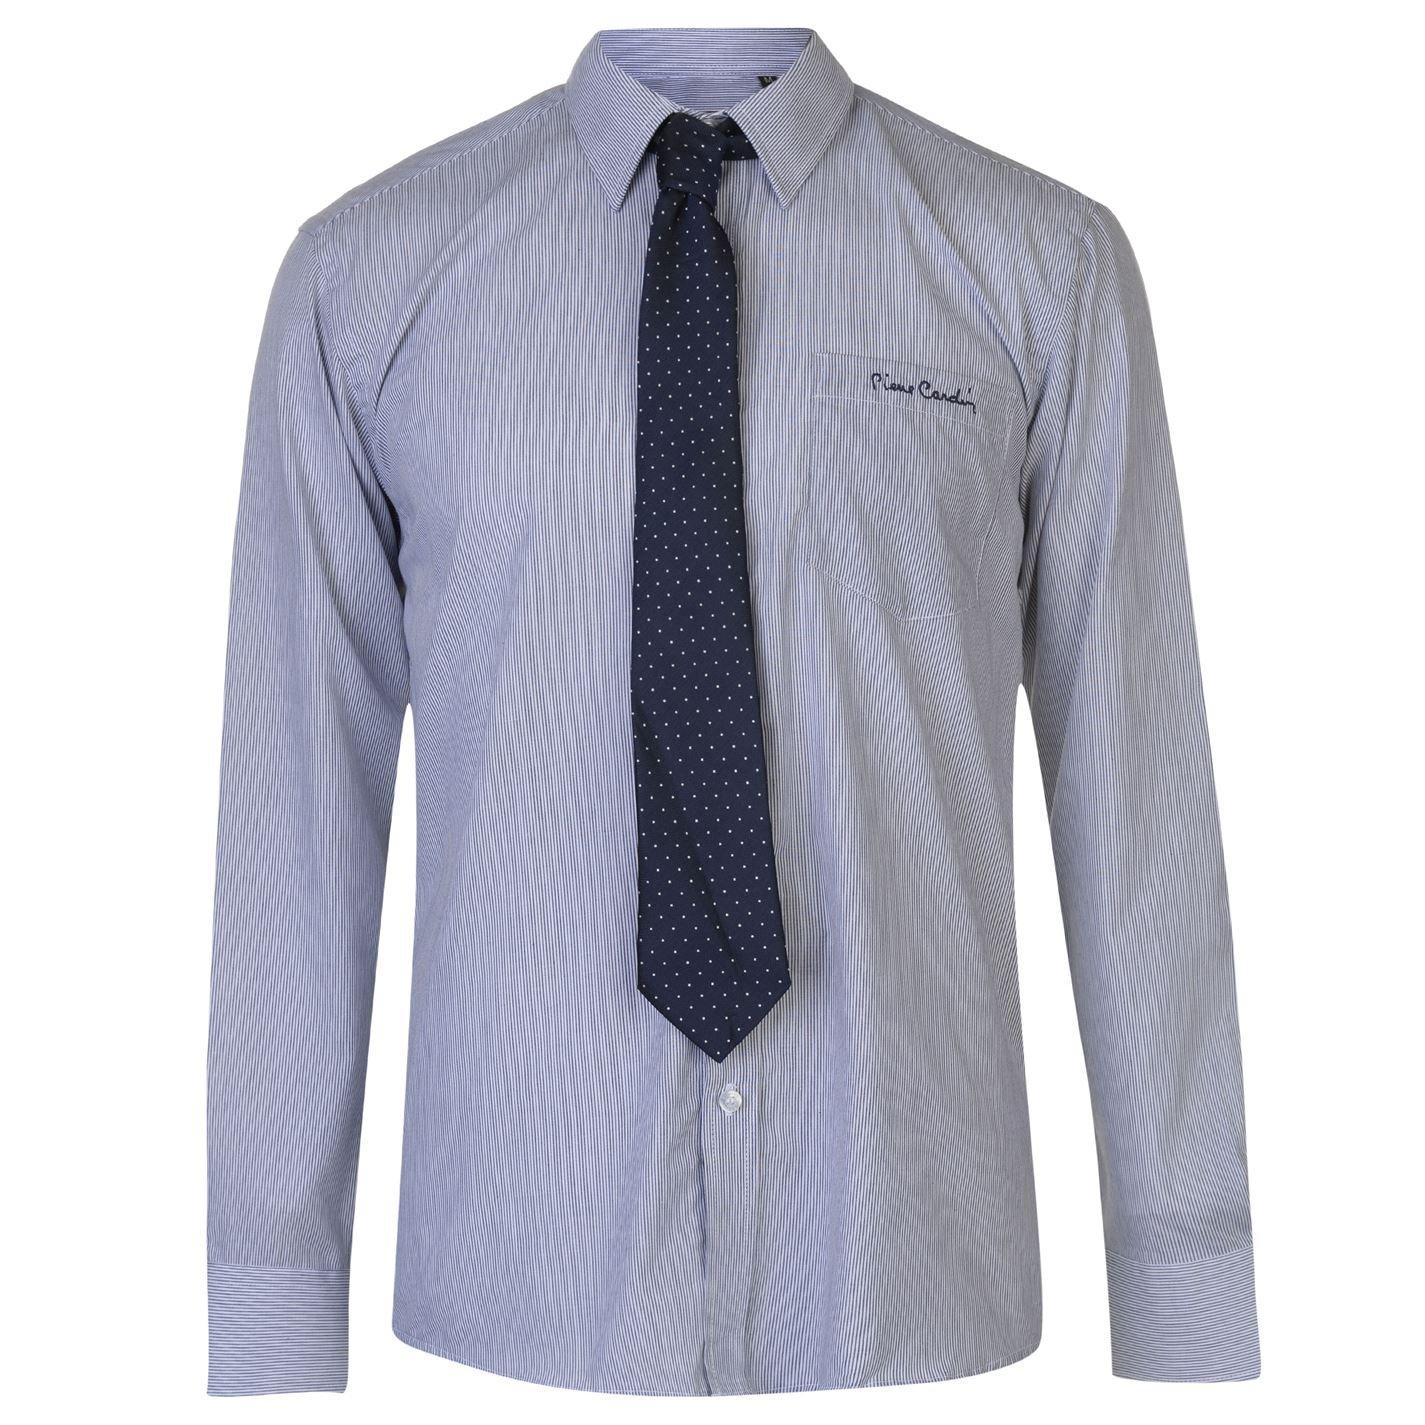 Pierre Cardin Mens Long Sleeve Shirt with Giorgio Tie